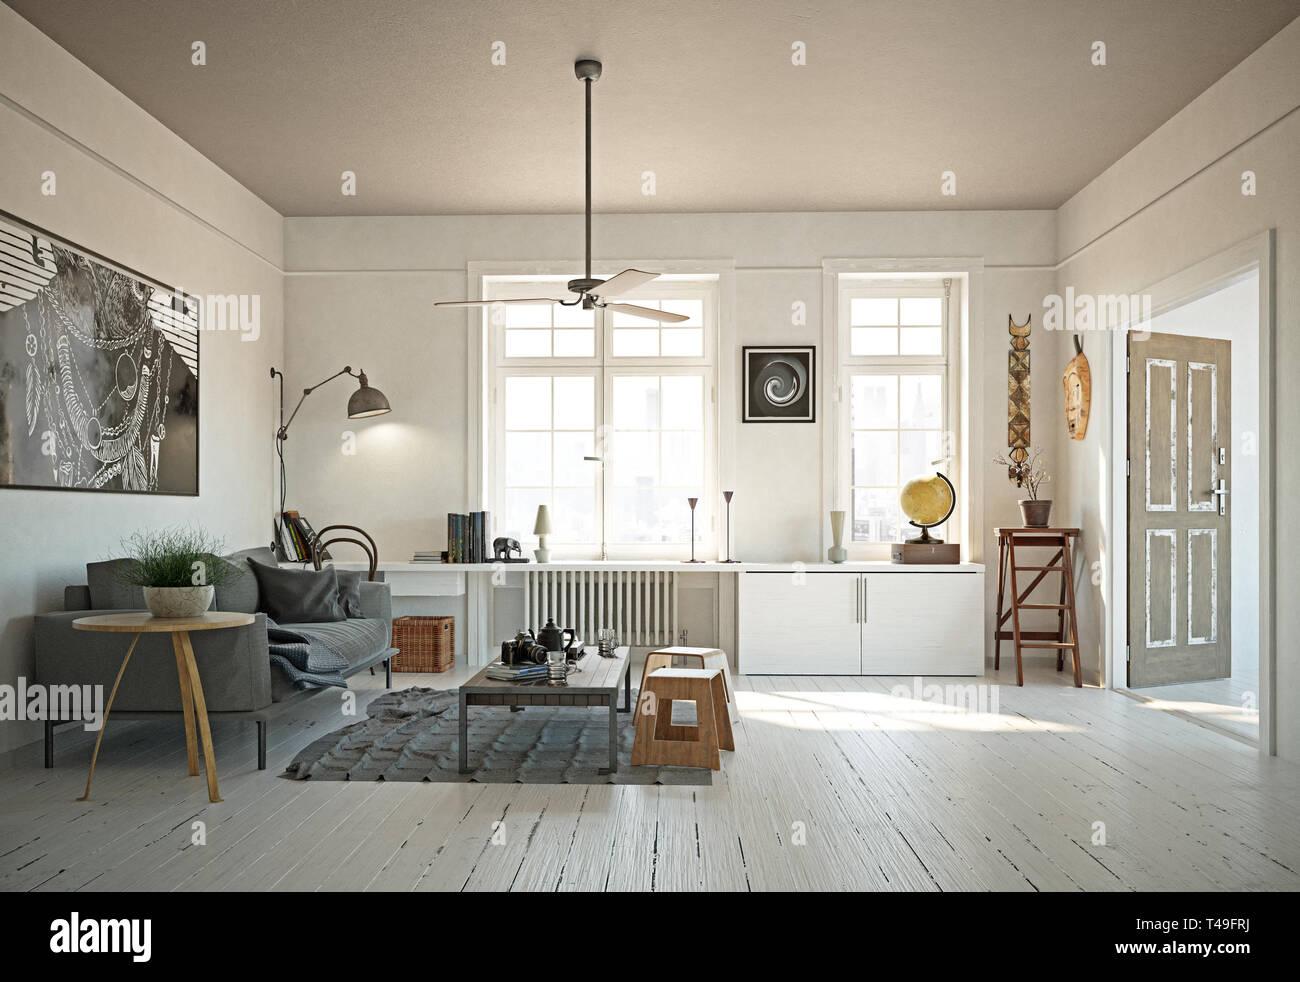 Modern Scandinavian Style Living Room Interior Design 3d Illustration Concept Stock Photo Alamy